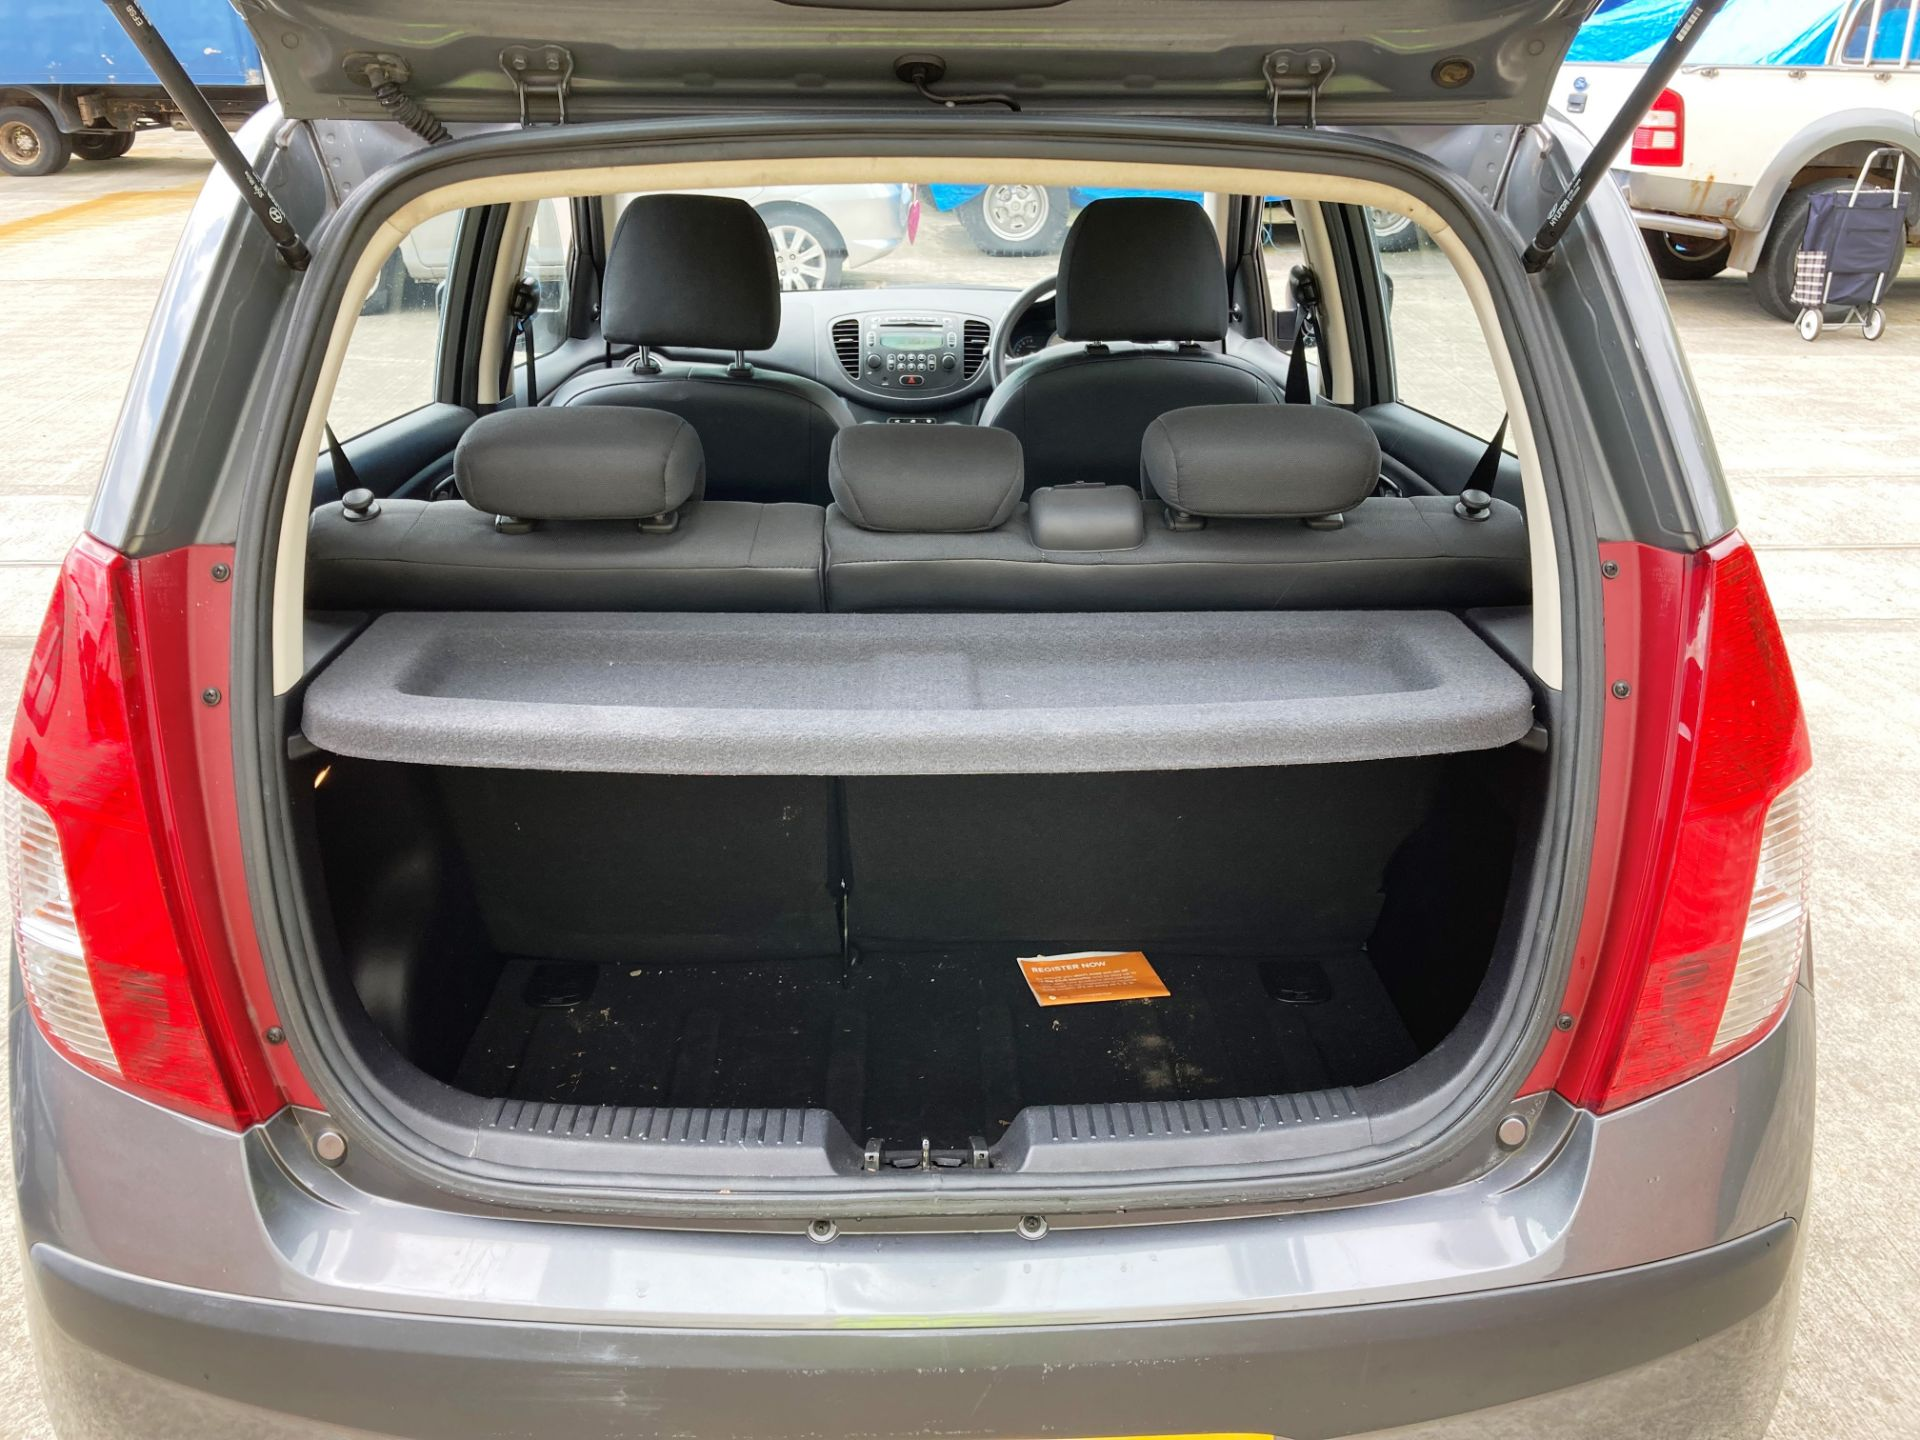 FROM A DECEASED ESTATE HYUNDAI i10 CLASSIC 5 door hatchback (1248cc) - petrol - grey Reg No: YR59 - Image 5 of 8